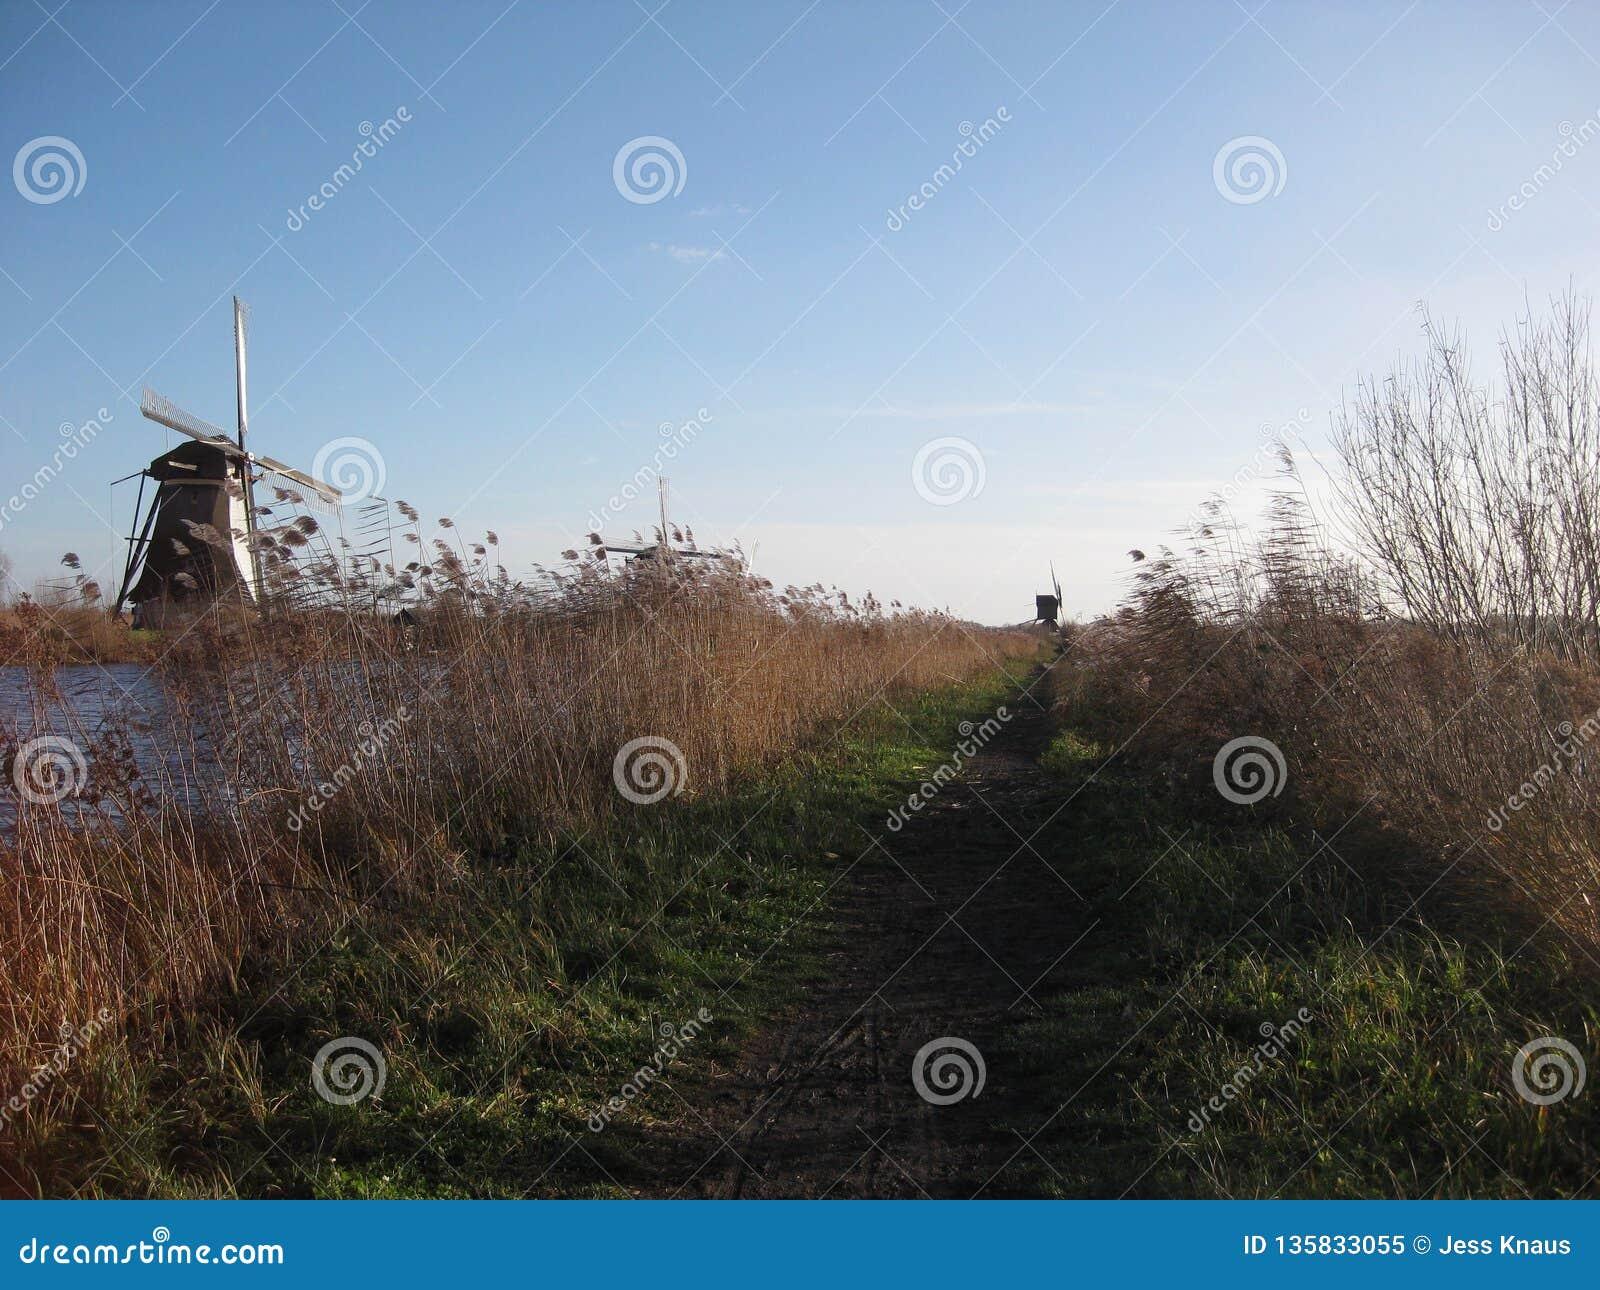 A grassy walking path running along the Kinderdijk near Rotterdam, The Netherlands